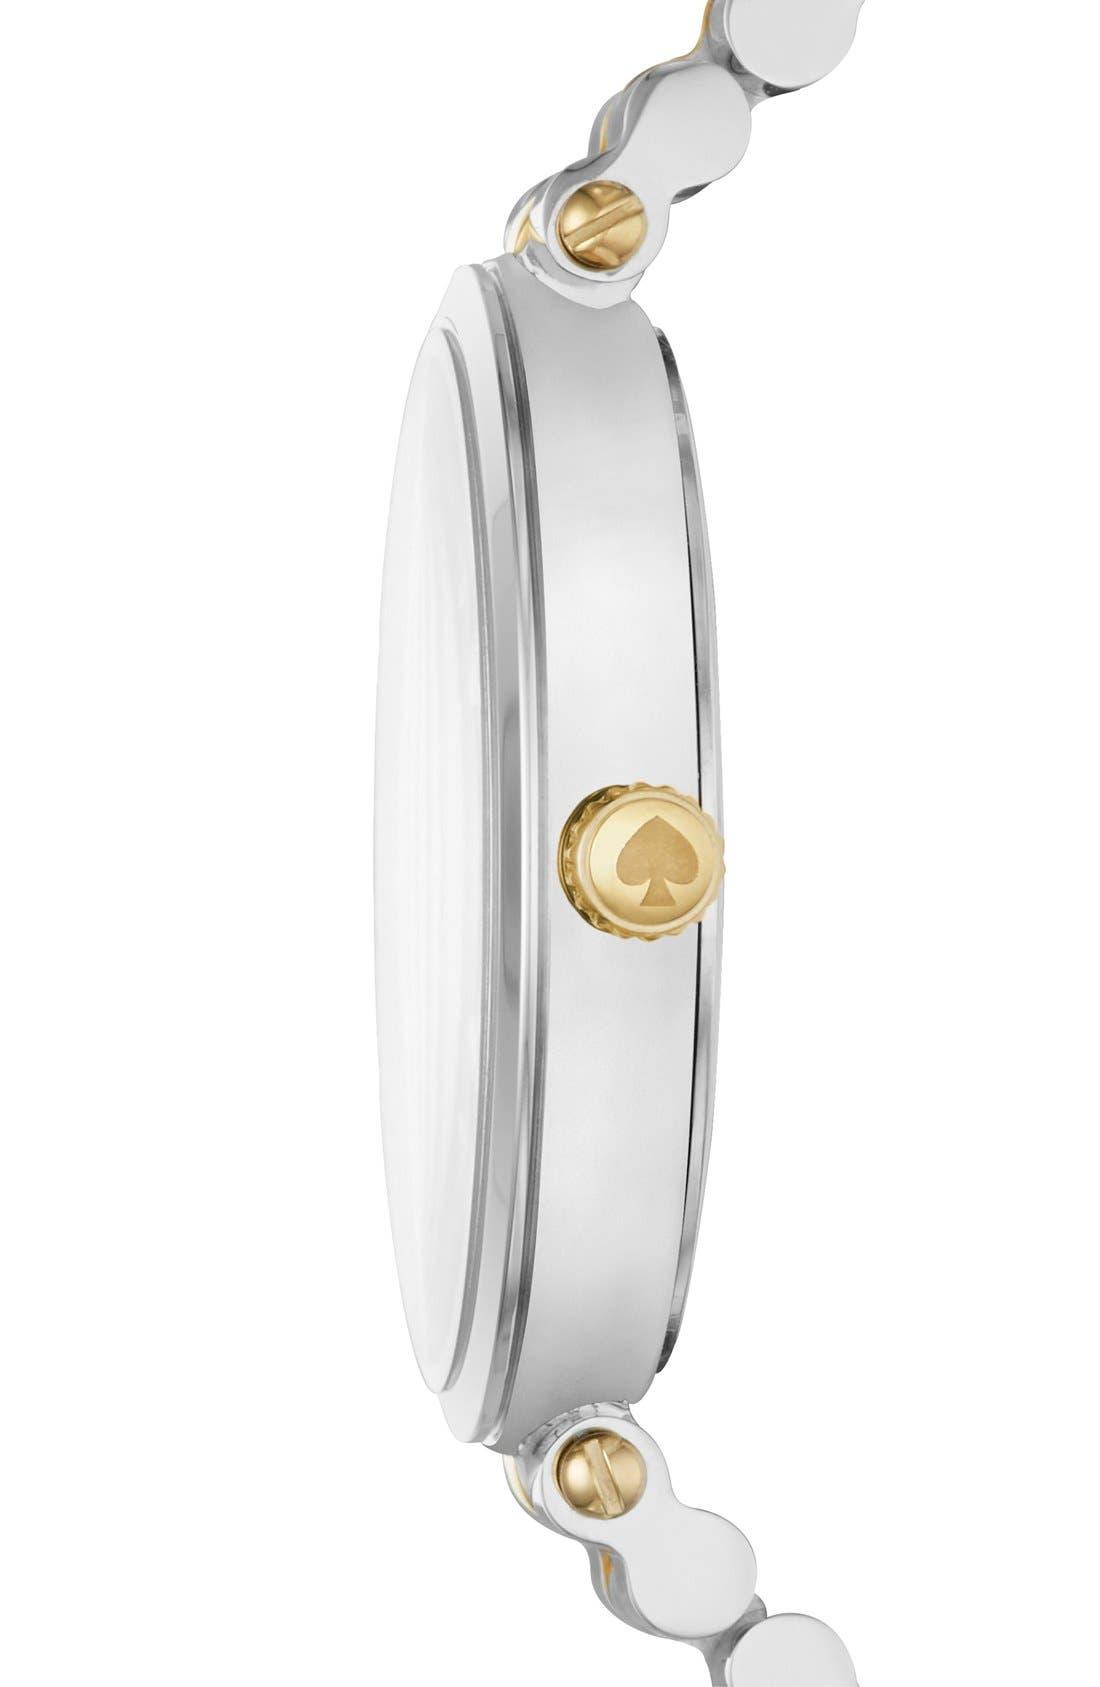 KATE SPADE NEW YORK,                             holland bracelet watch, 34mm,                             Alternate thumbnail 2, color,                             SILVER/ GOLD